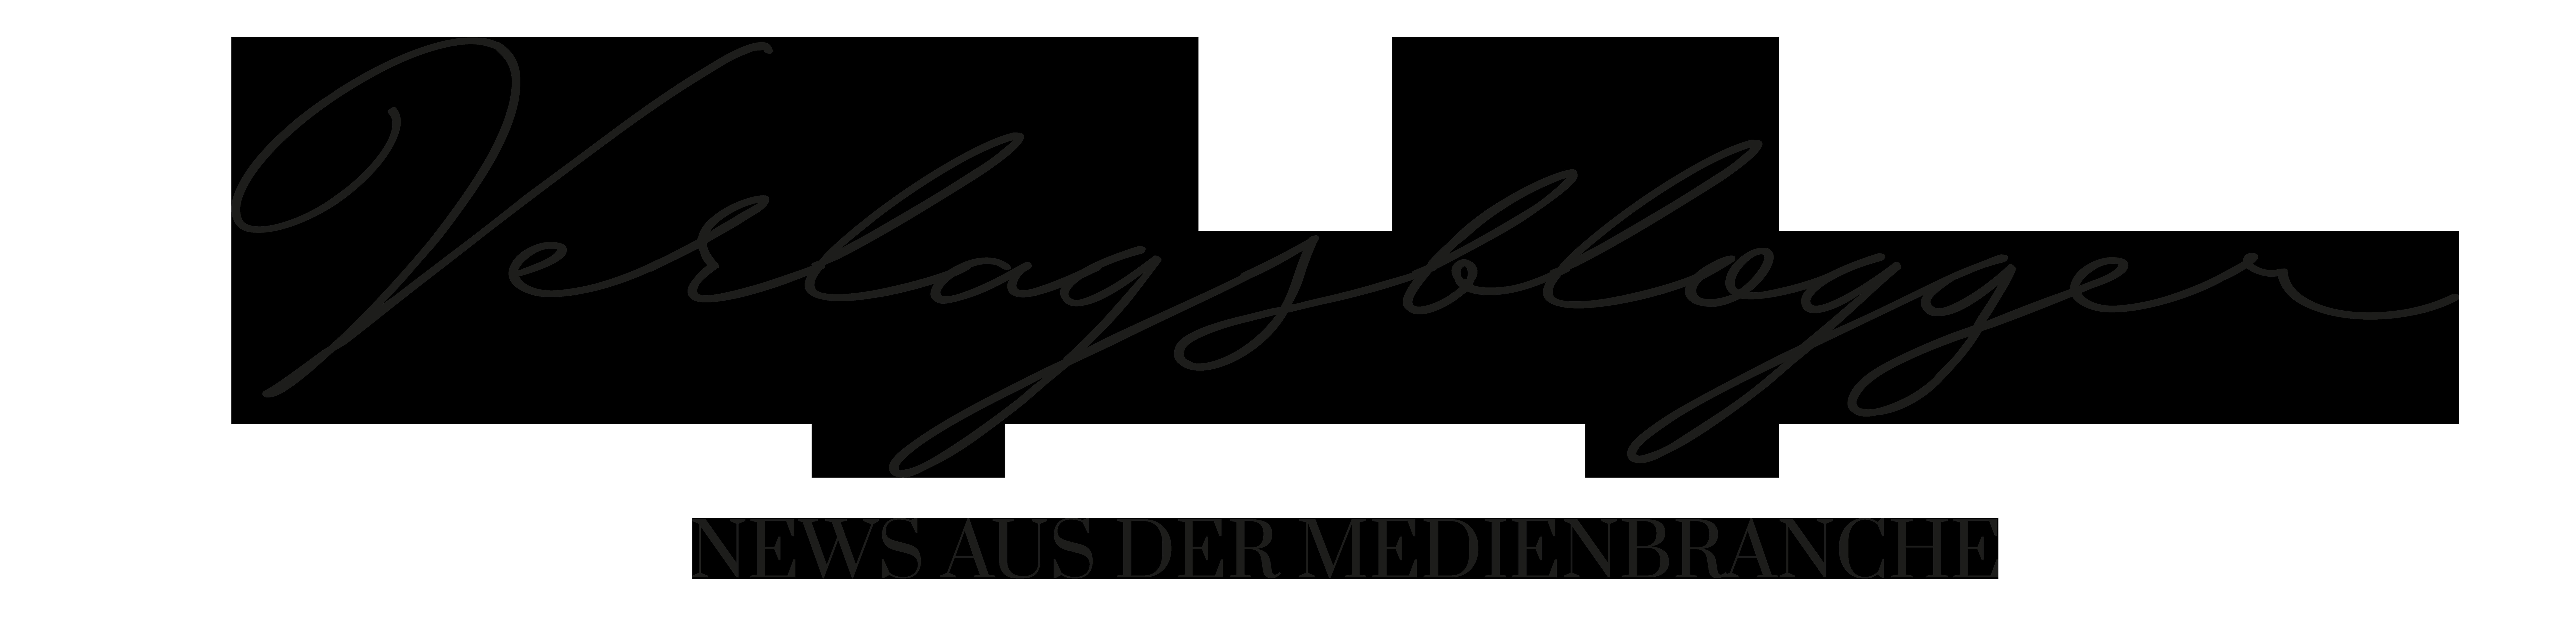 Verlagsblogger